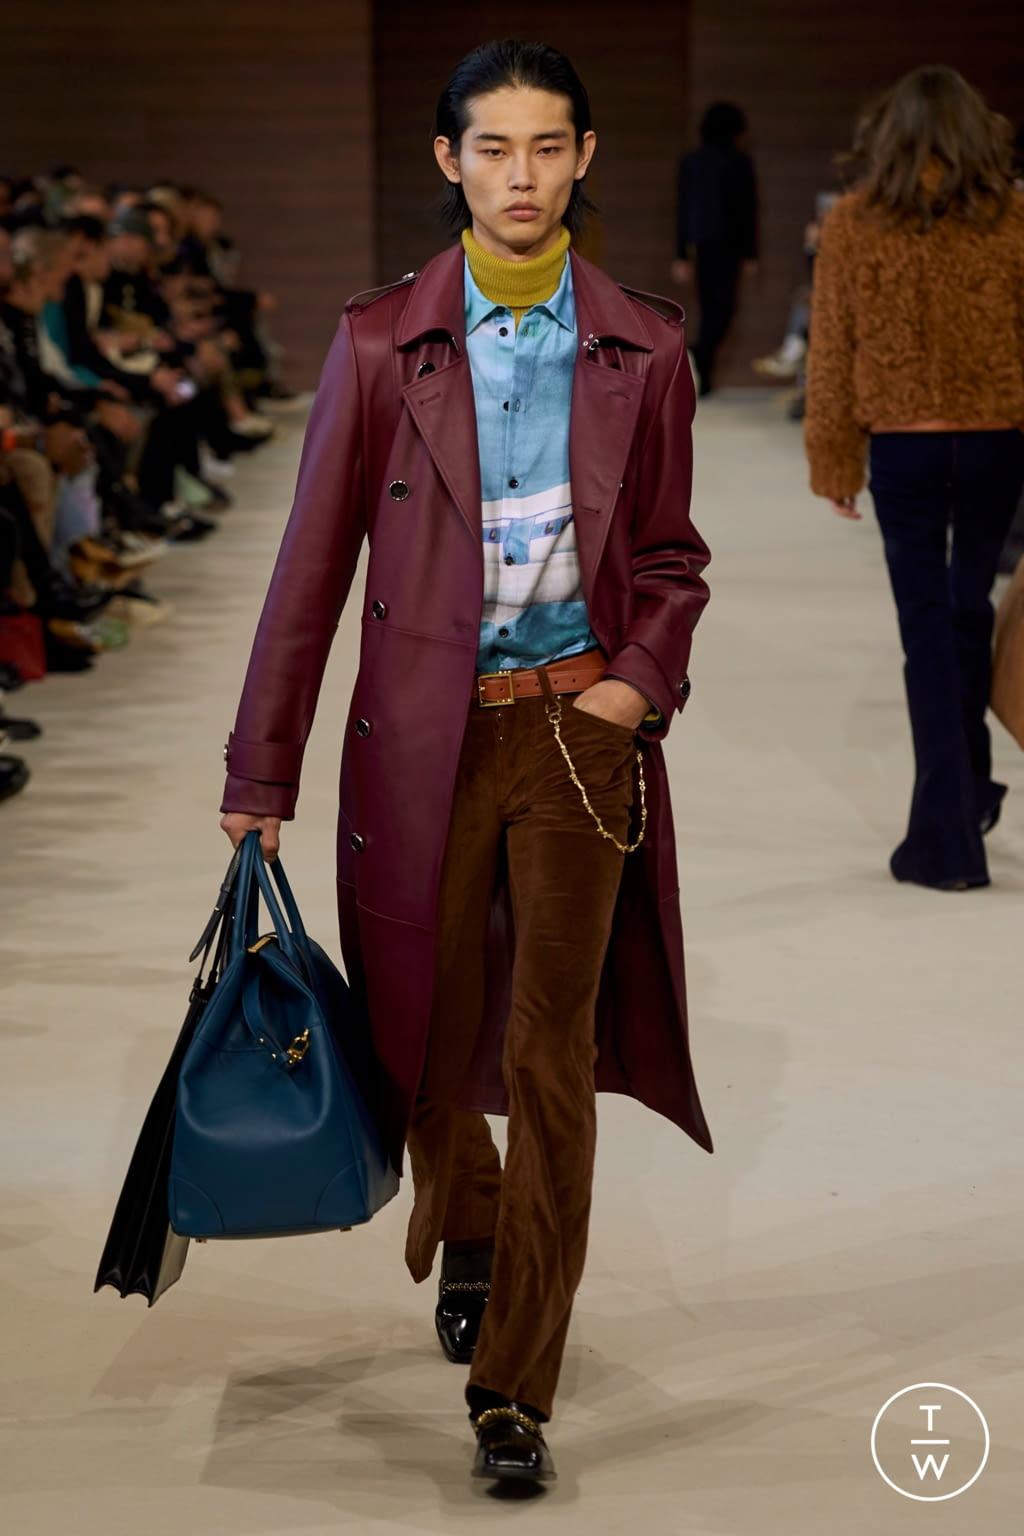 Fashion Week Paris Fall/Winter 2020 look 21 de la collection Amiri menswear